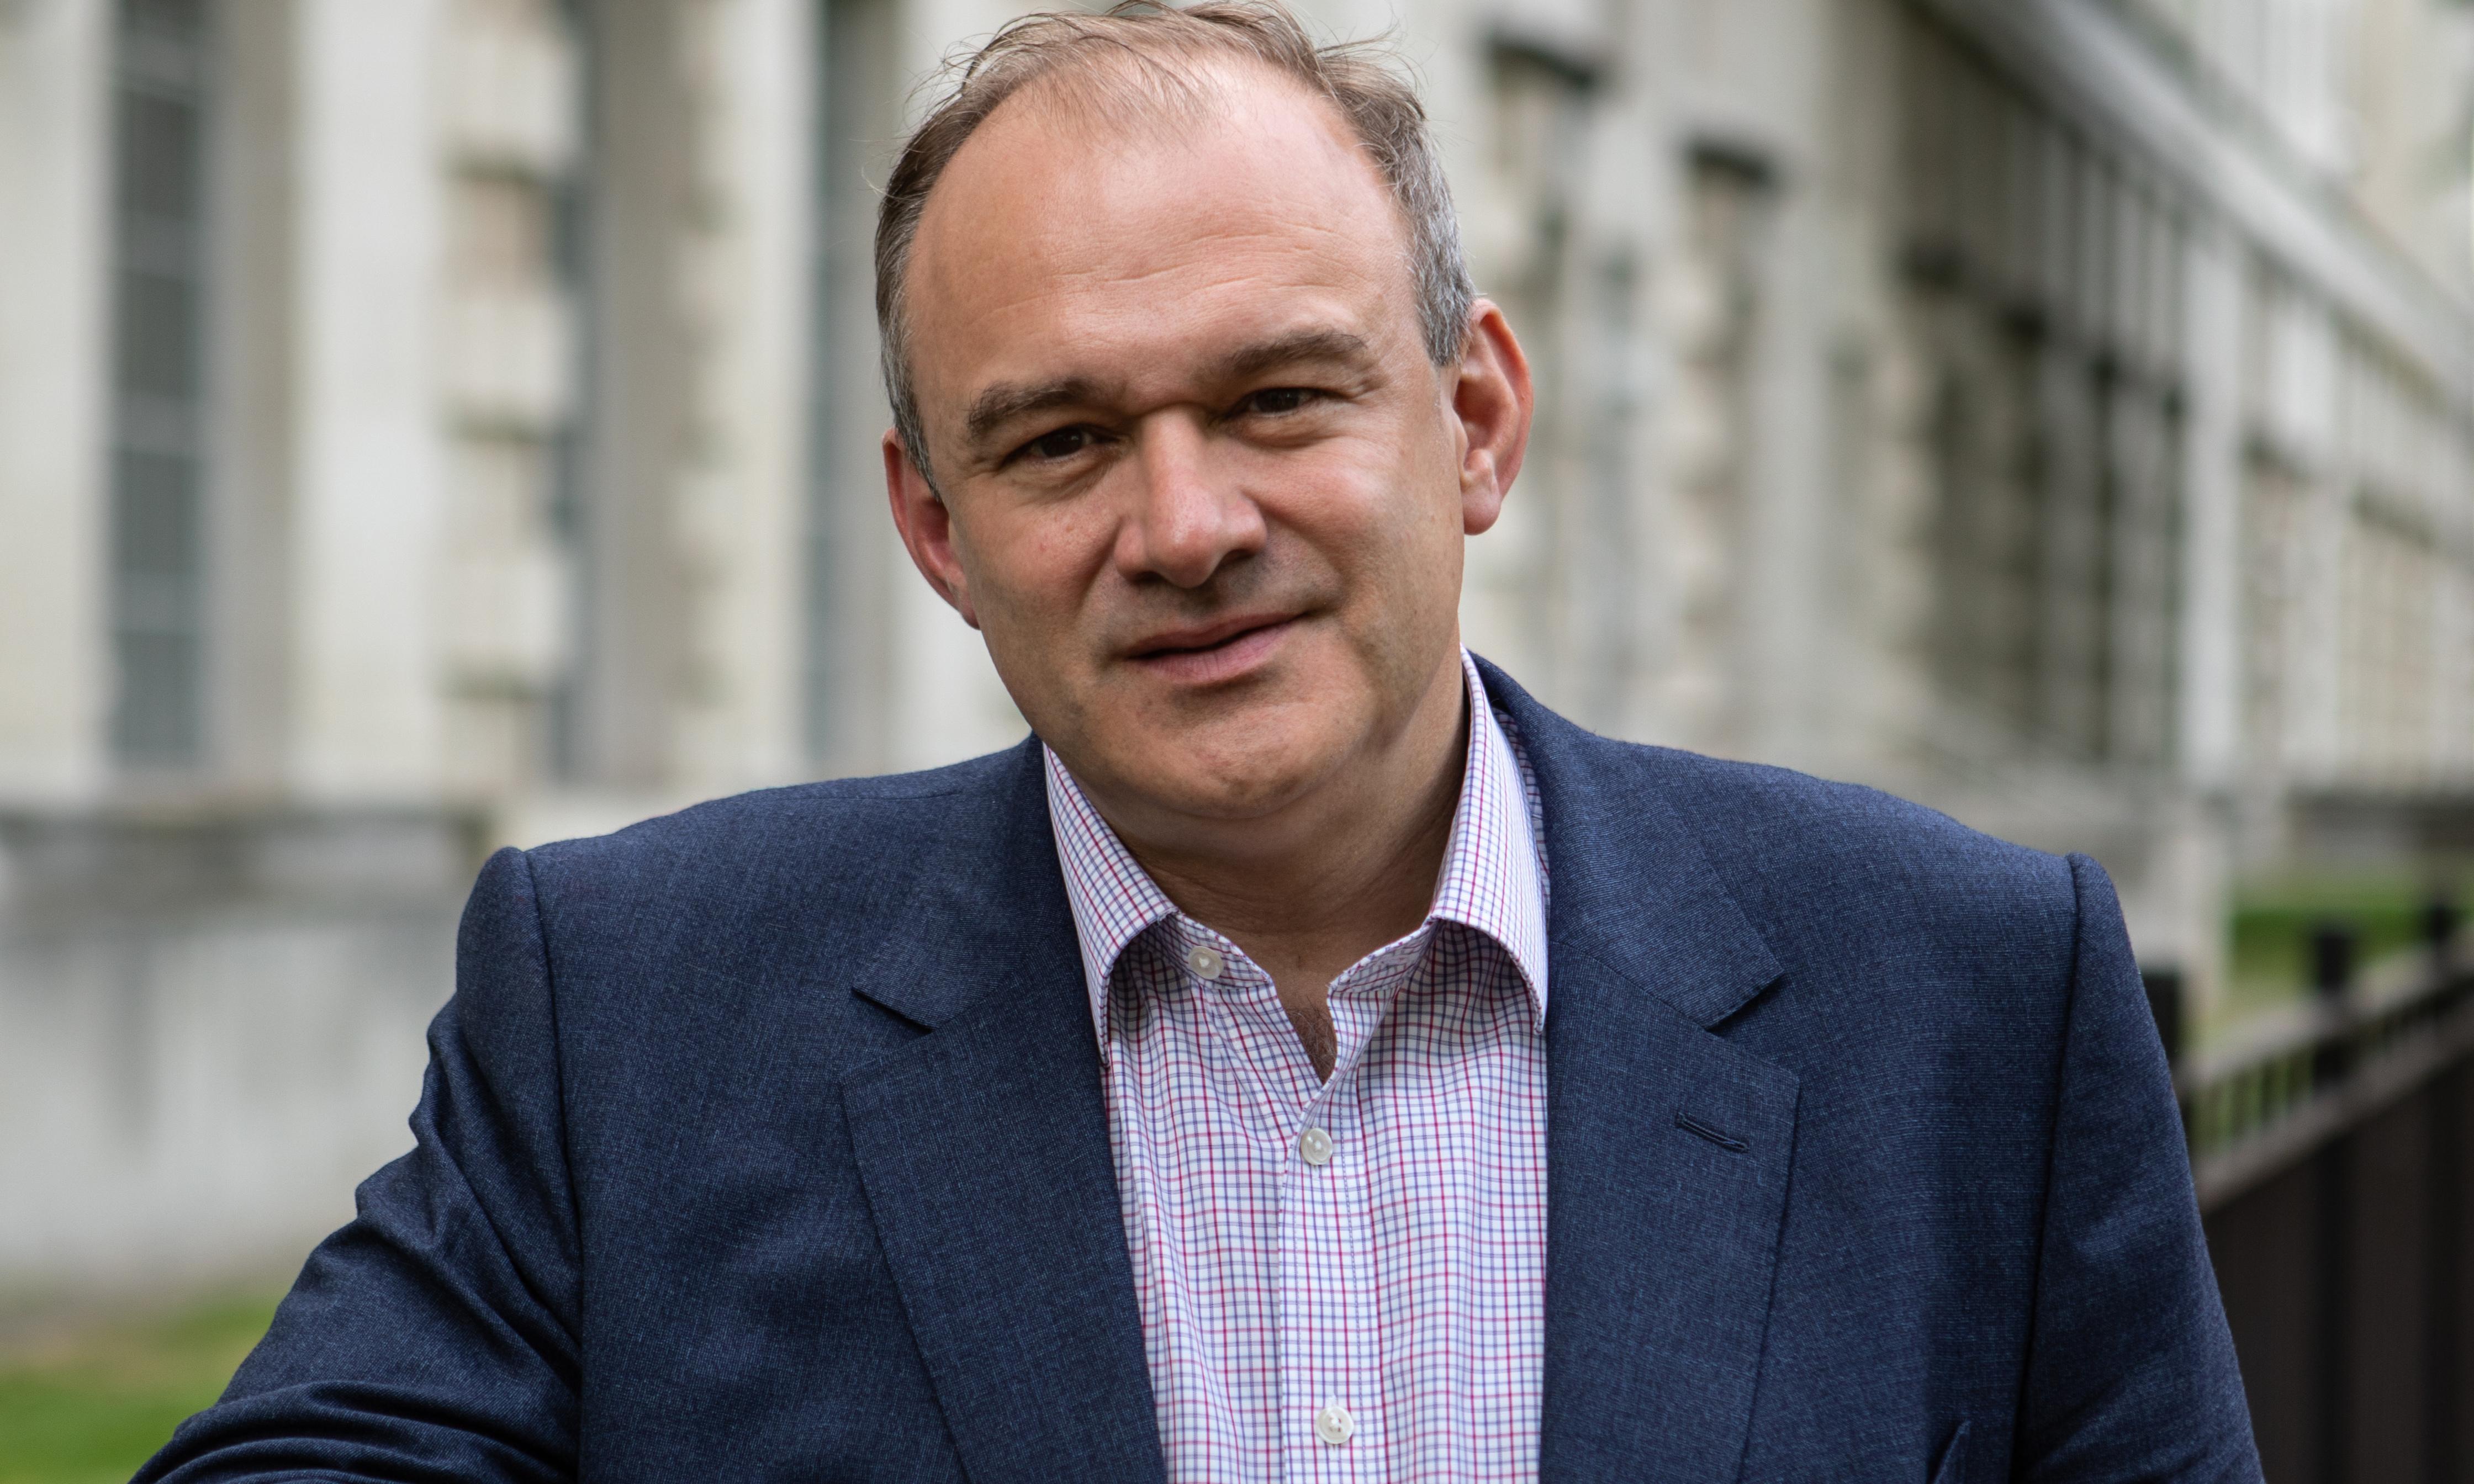 Yvette Cooper or Hilary Benn should lead unity government to halt Brexit – Ed Davey